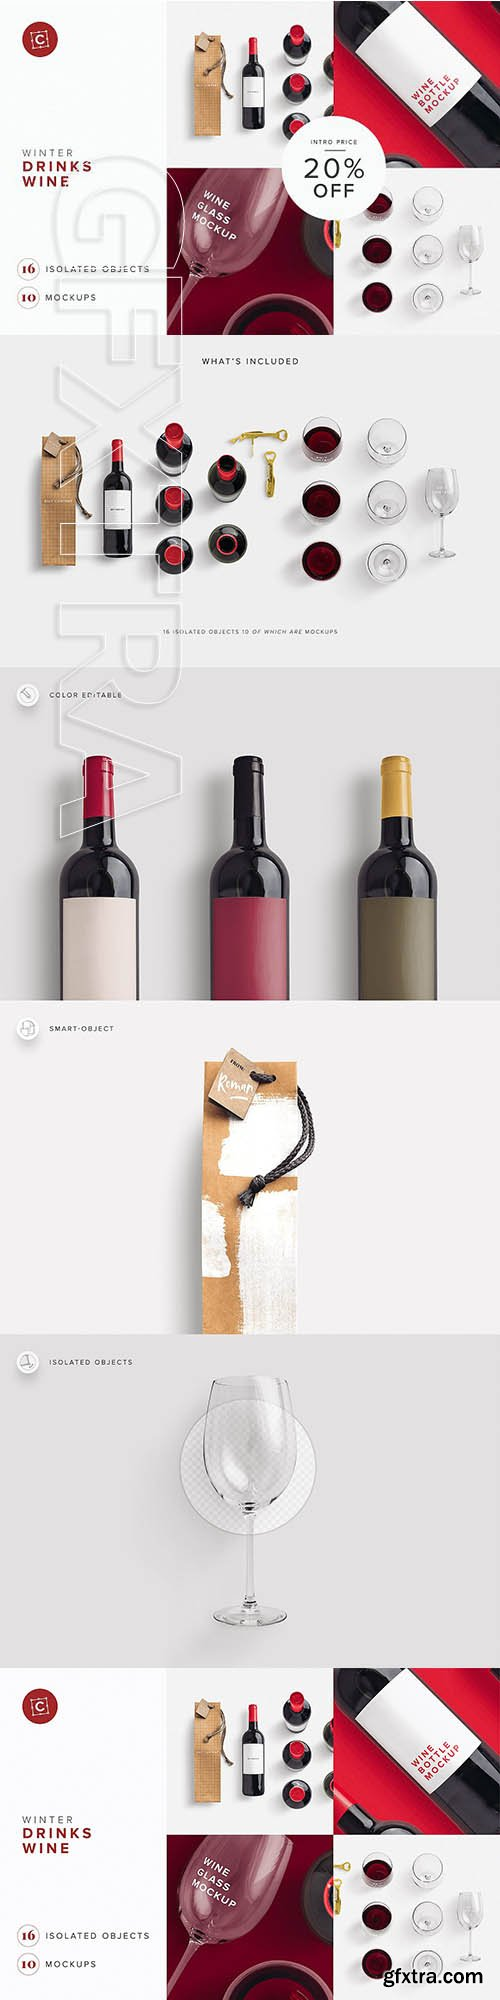 CreativeMarket - Wine Bottle Glass Bag PSD Mockup 3214180